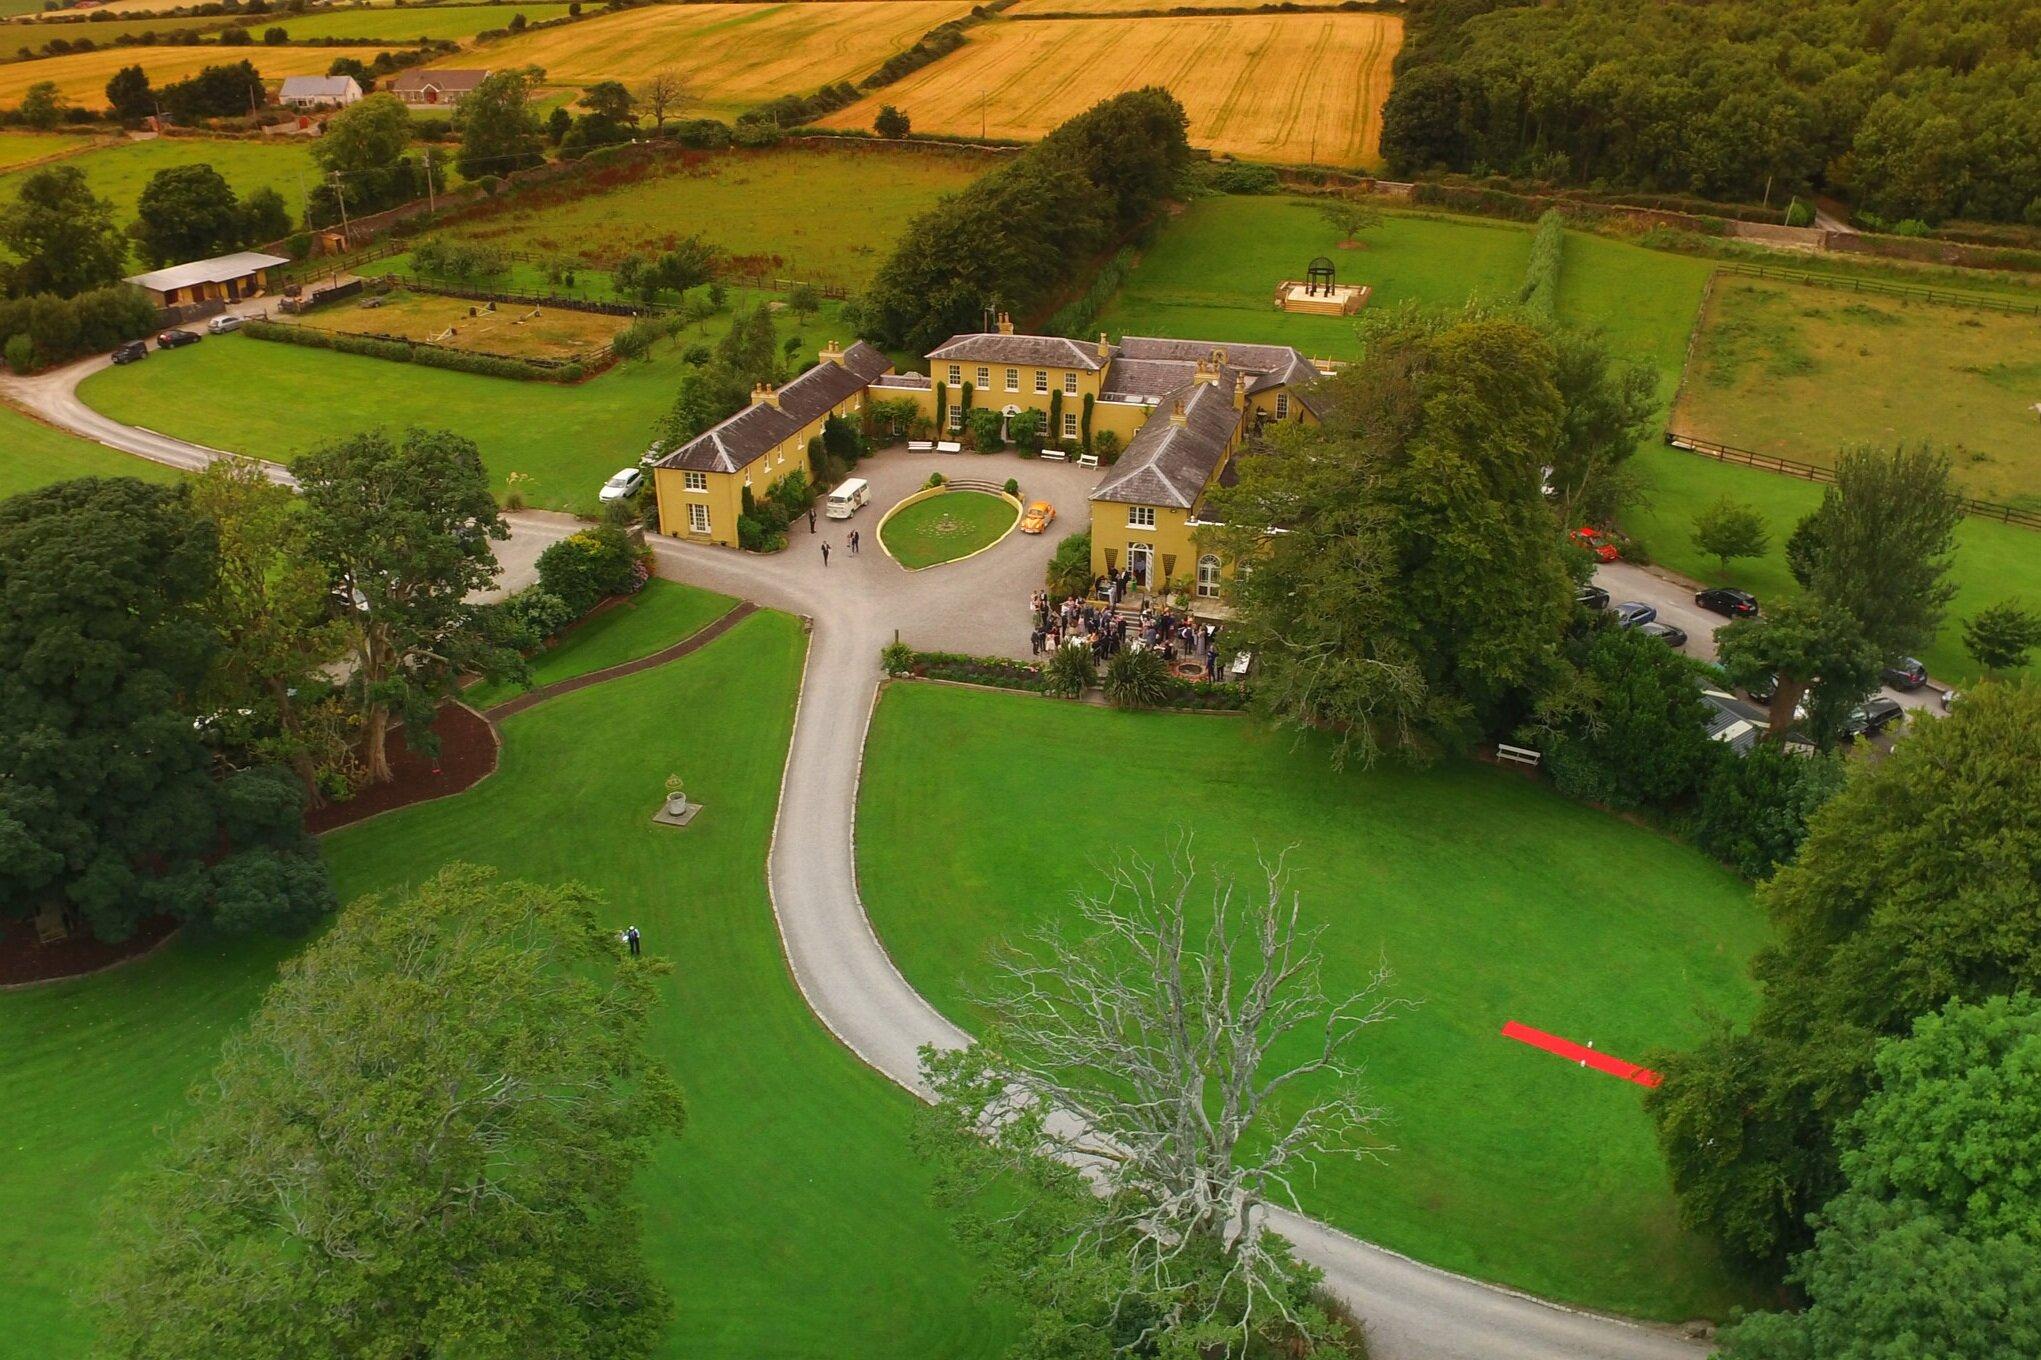 Historic Georgian Estate - Kinsale, Ireland$9,925,000   Beds: 28   Baths: 30   SqFt: 24,000